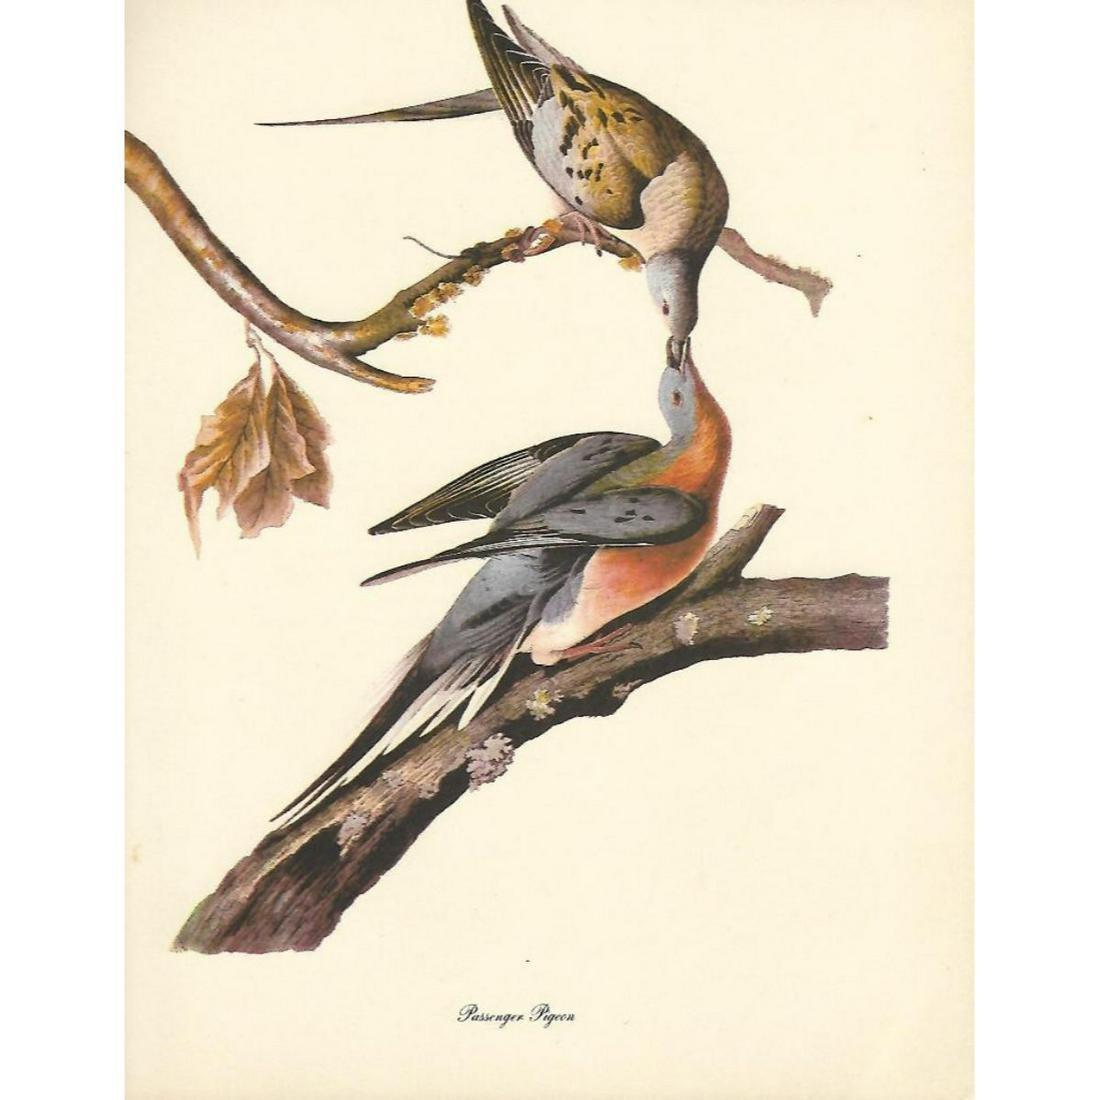 c1950 Audubon Print, Passenger Pigeon